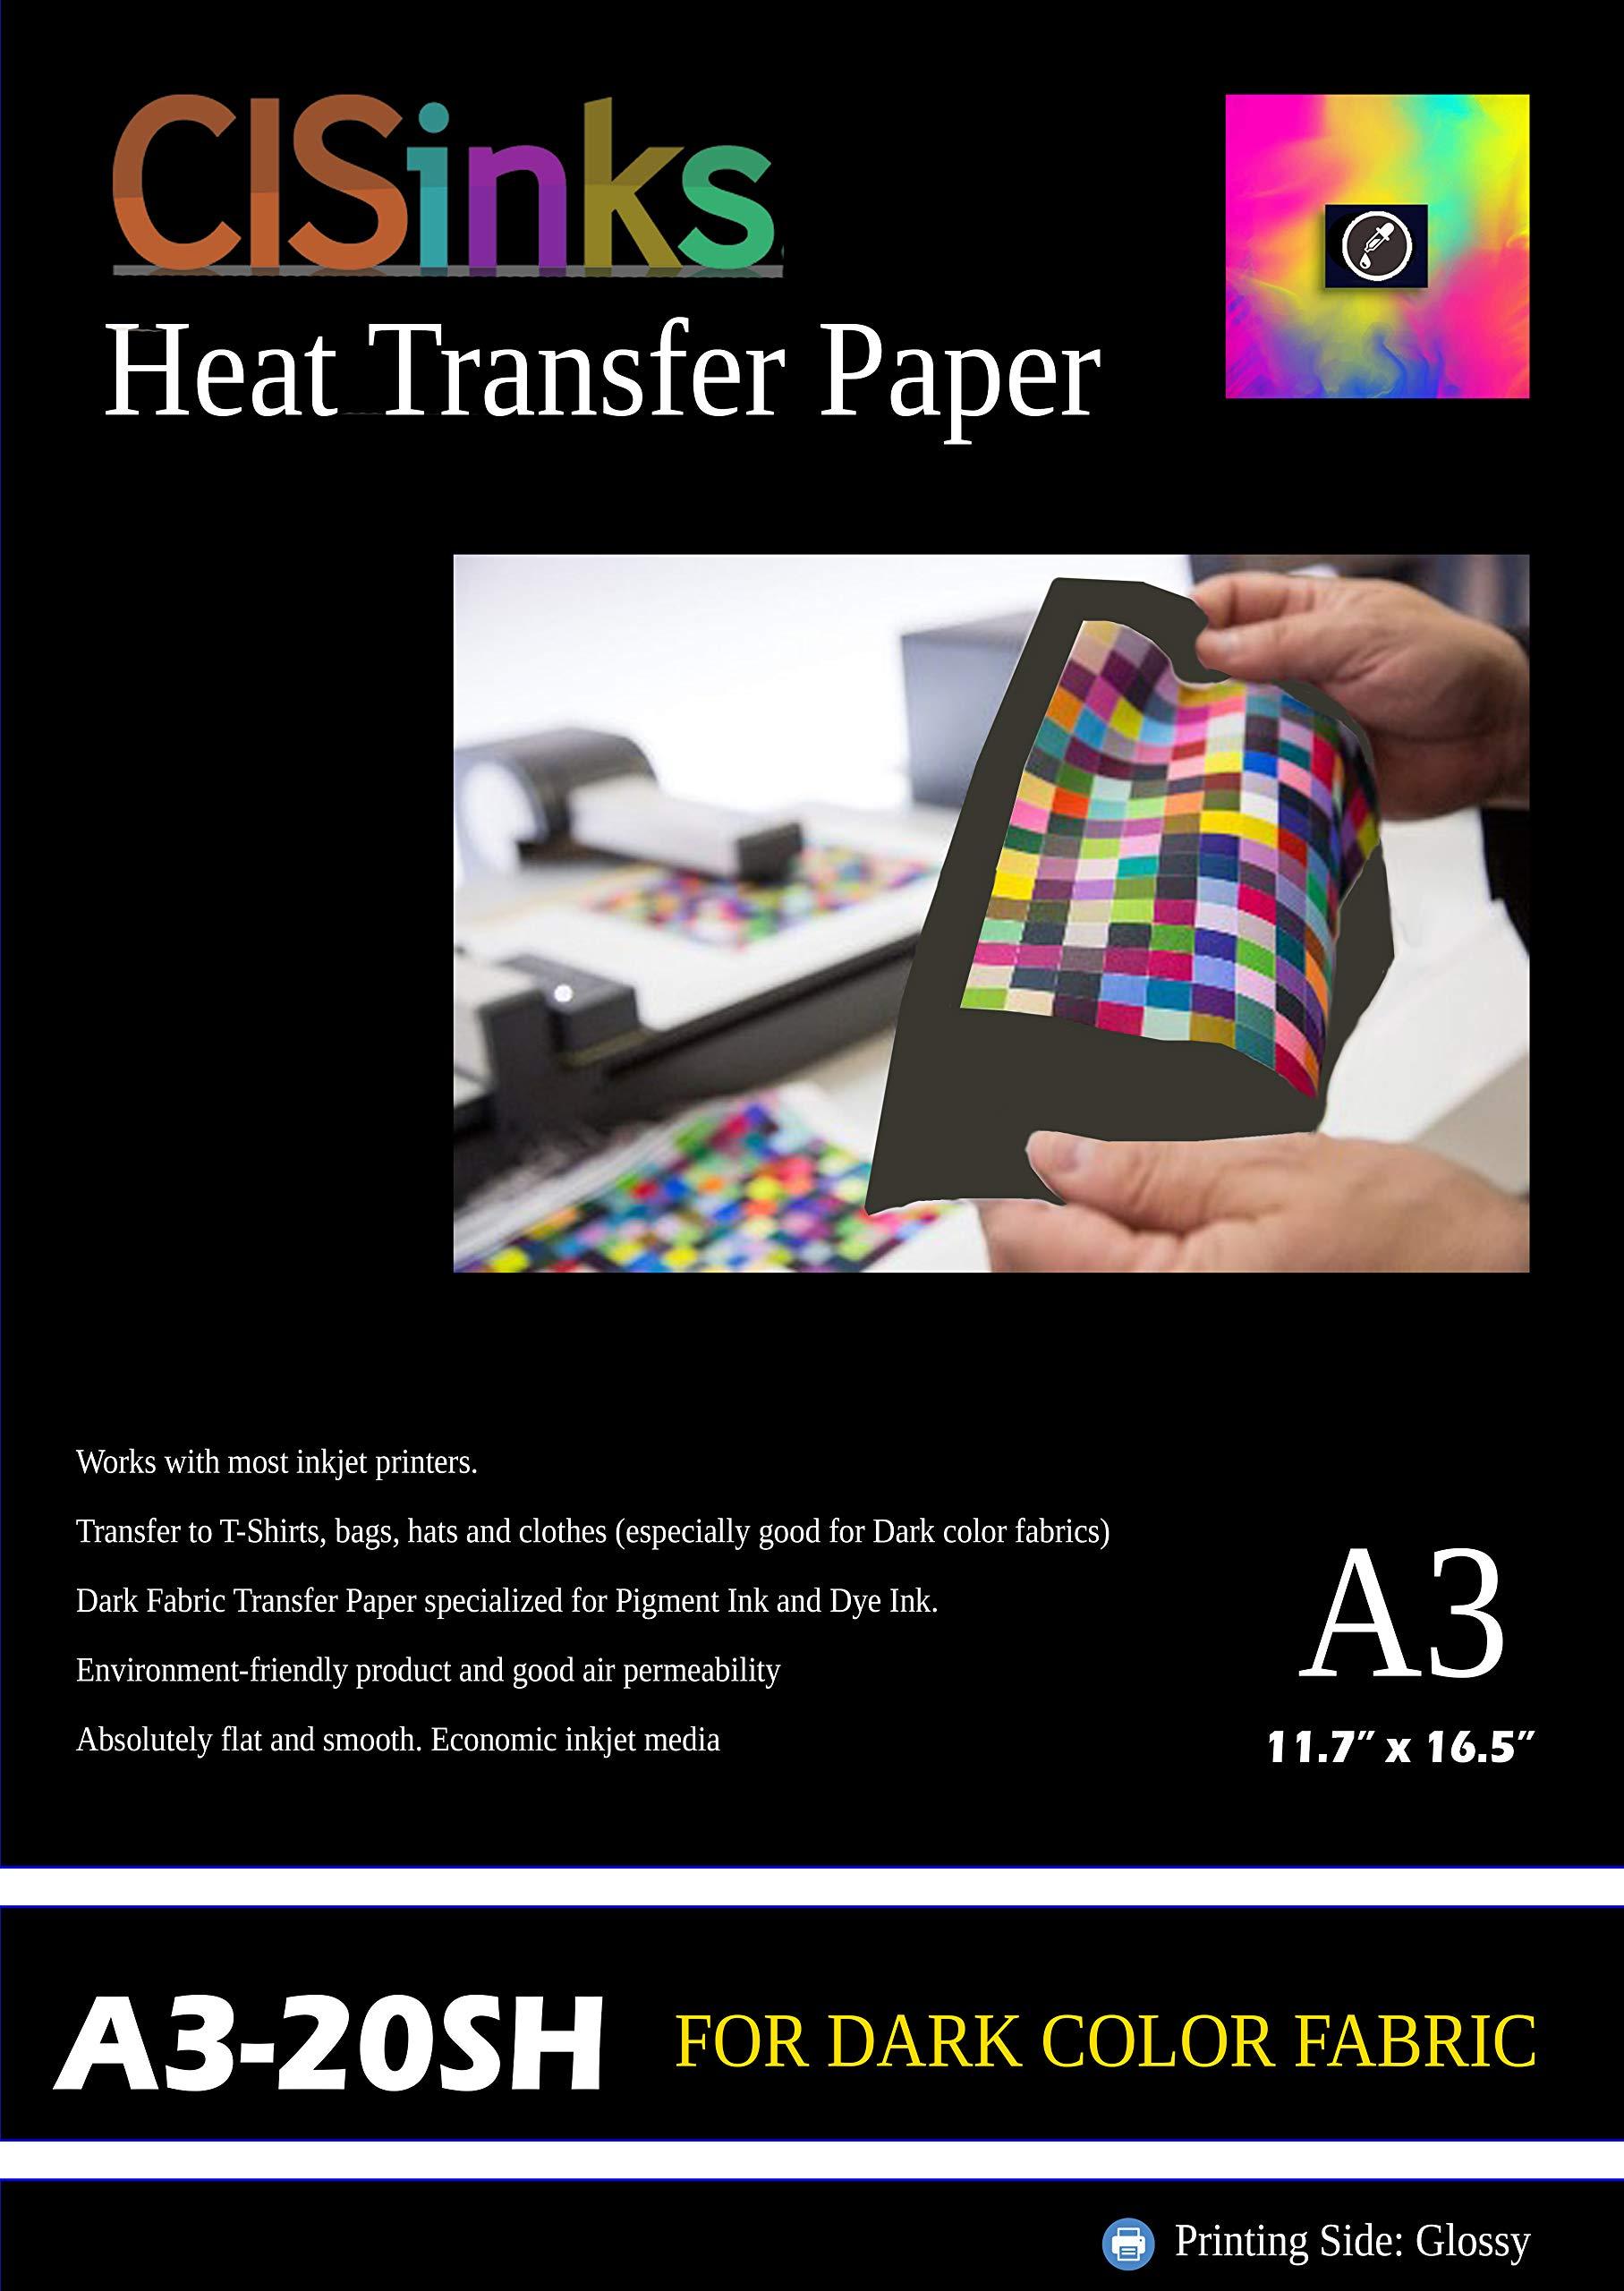 CISinks 20 Sheets Heat Transfer Paper A3 (12'' x 16.5'') for Dark Color Fabrics